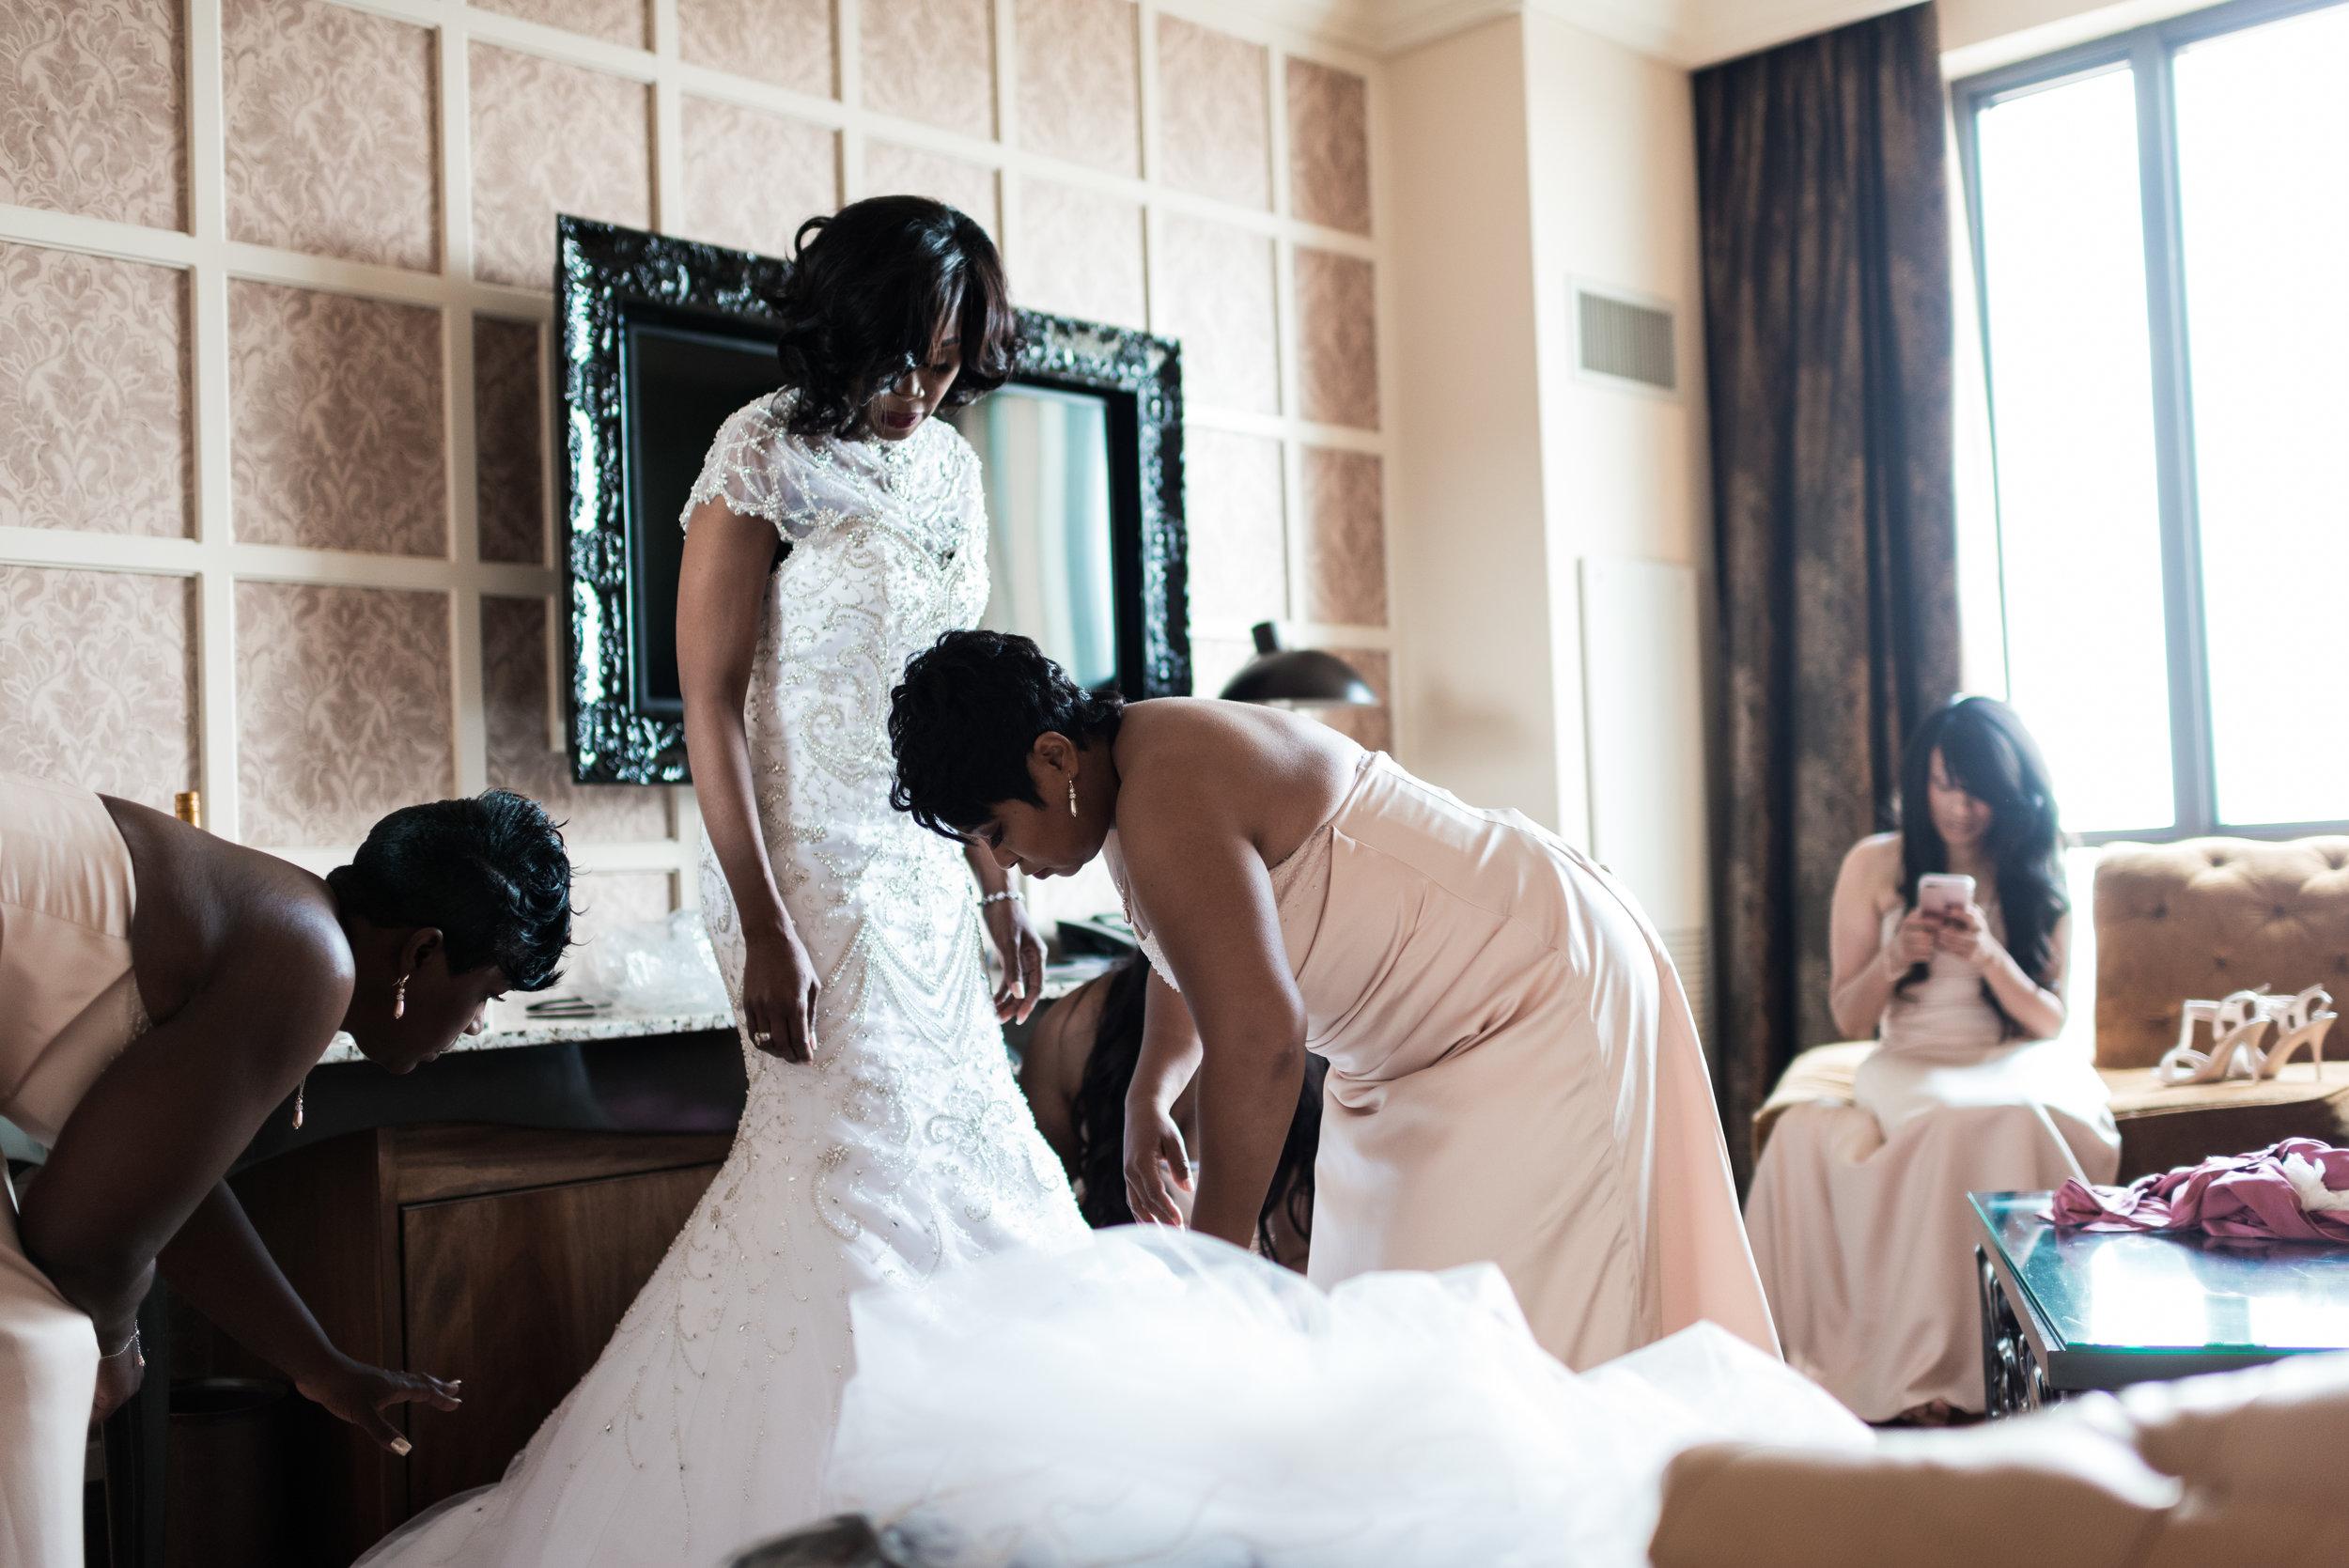 st-louis-wedding-photographer-third-baptist-church-195.jpg